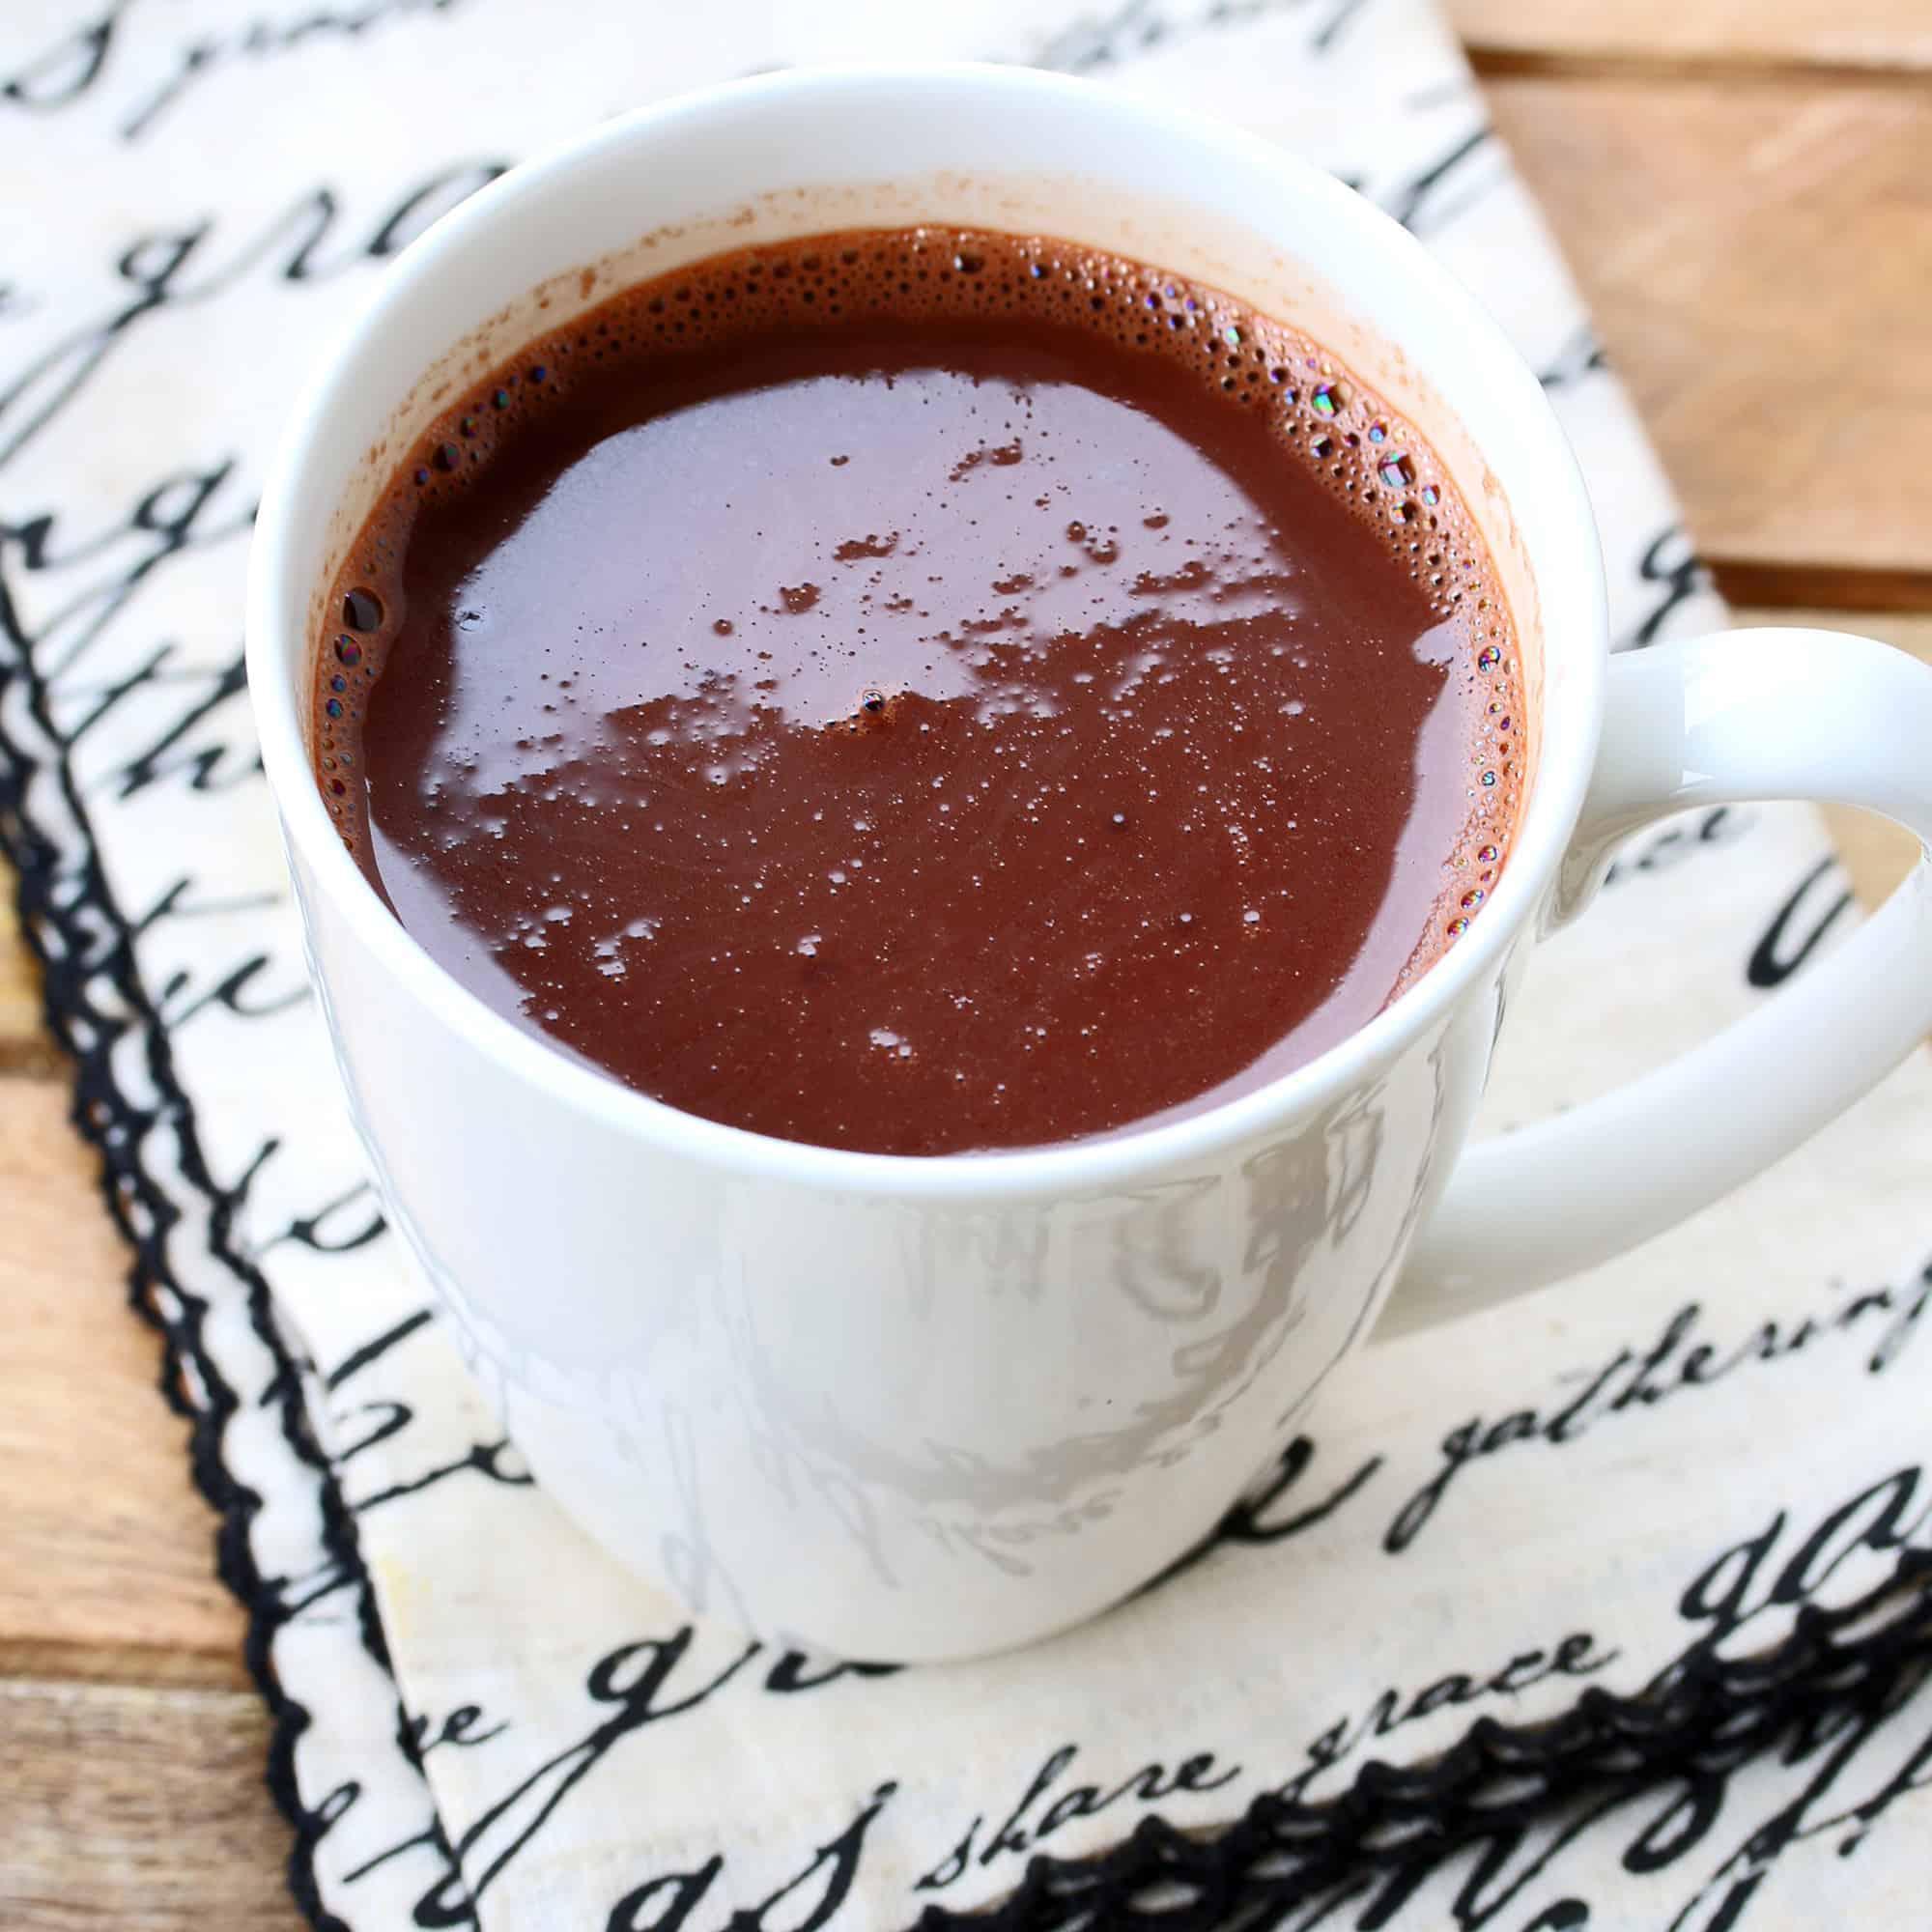 french parisian hot chocolate recipe european authentic dark bittersweet low sugar